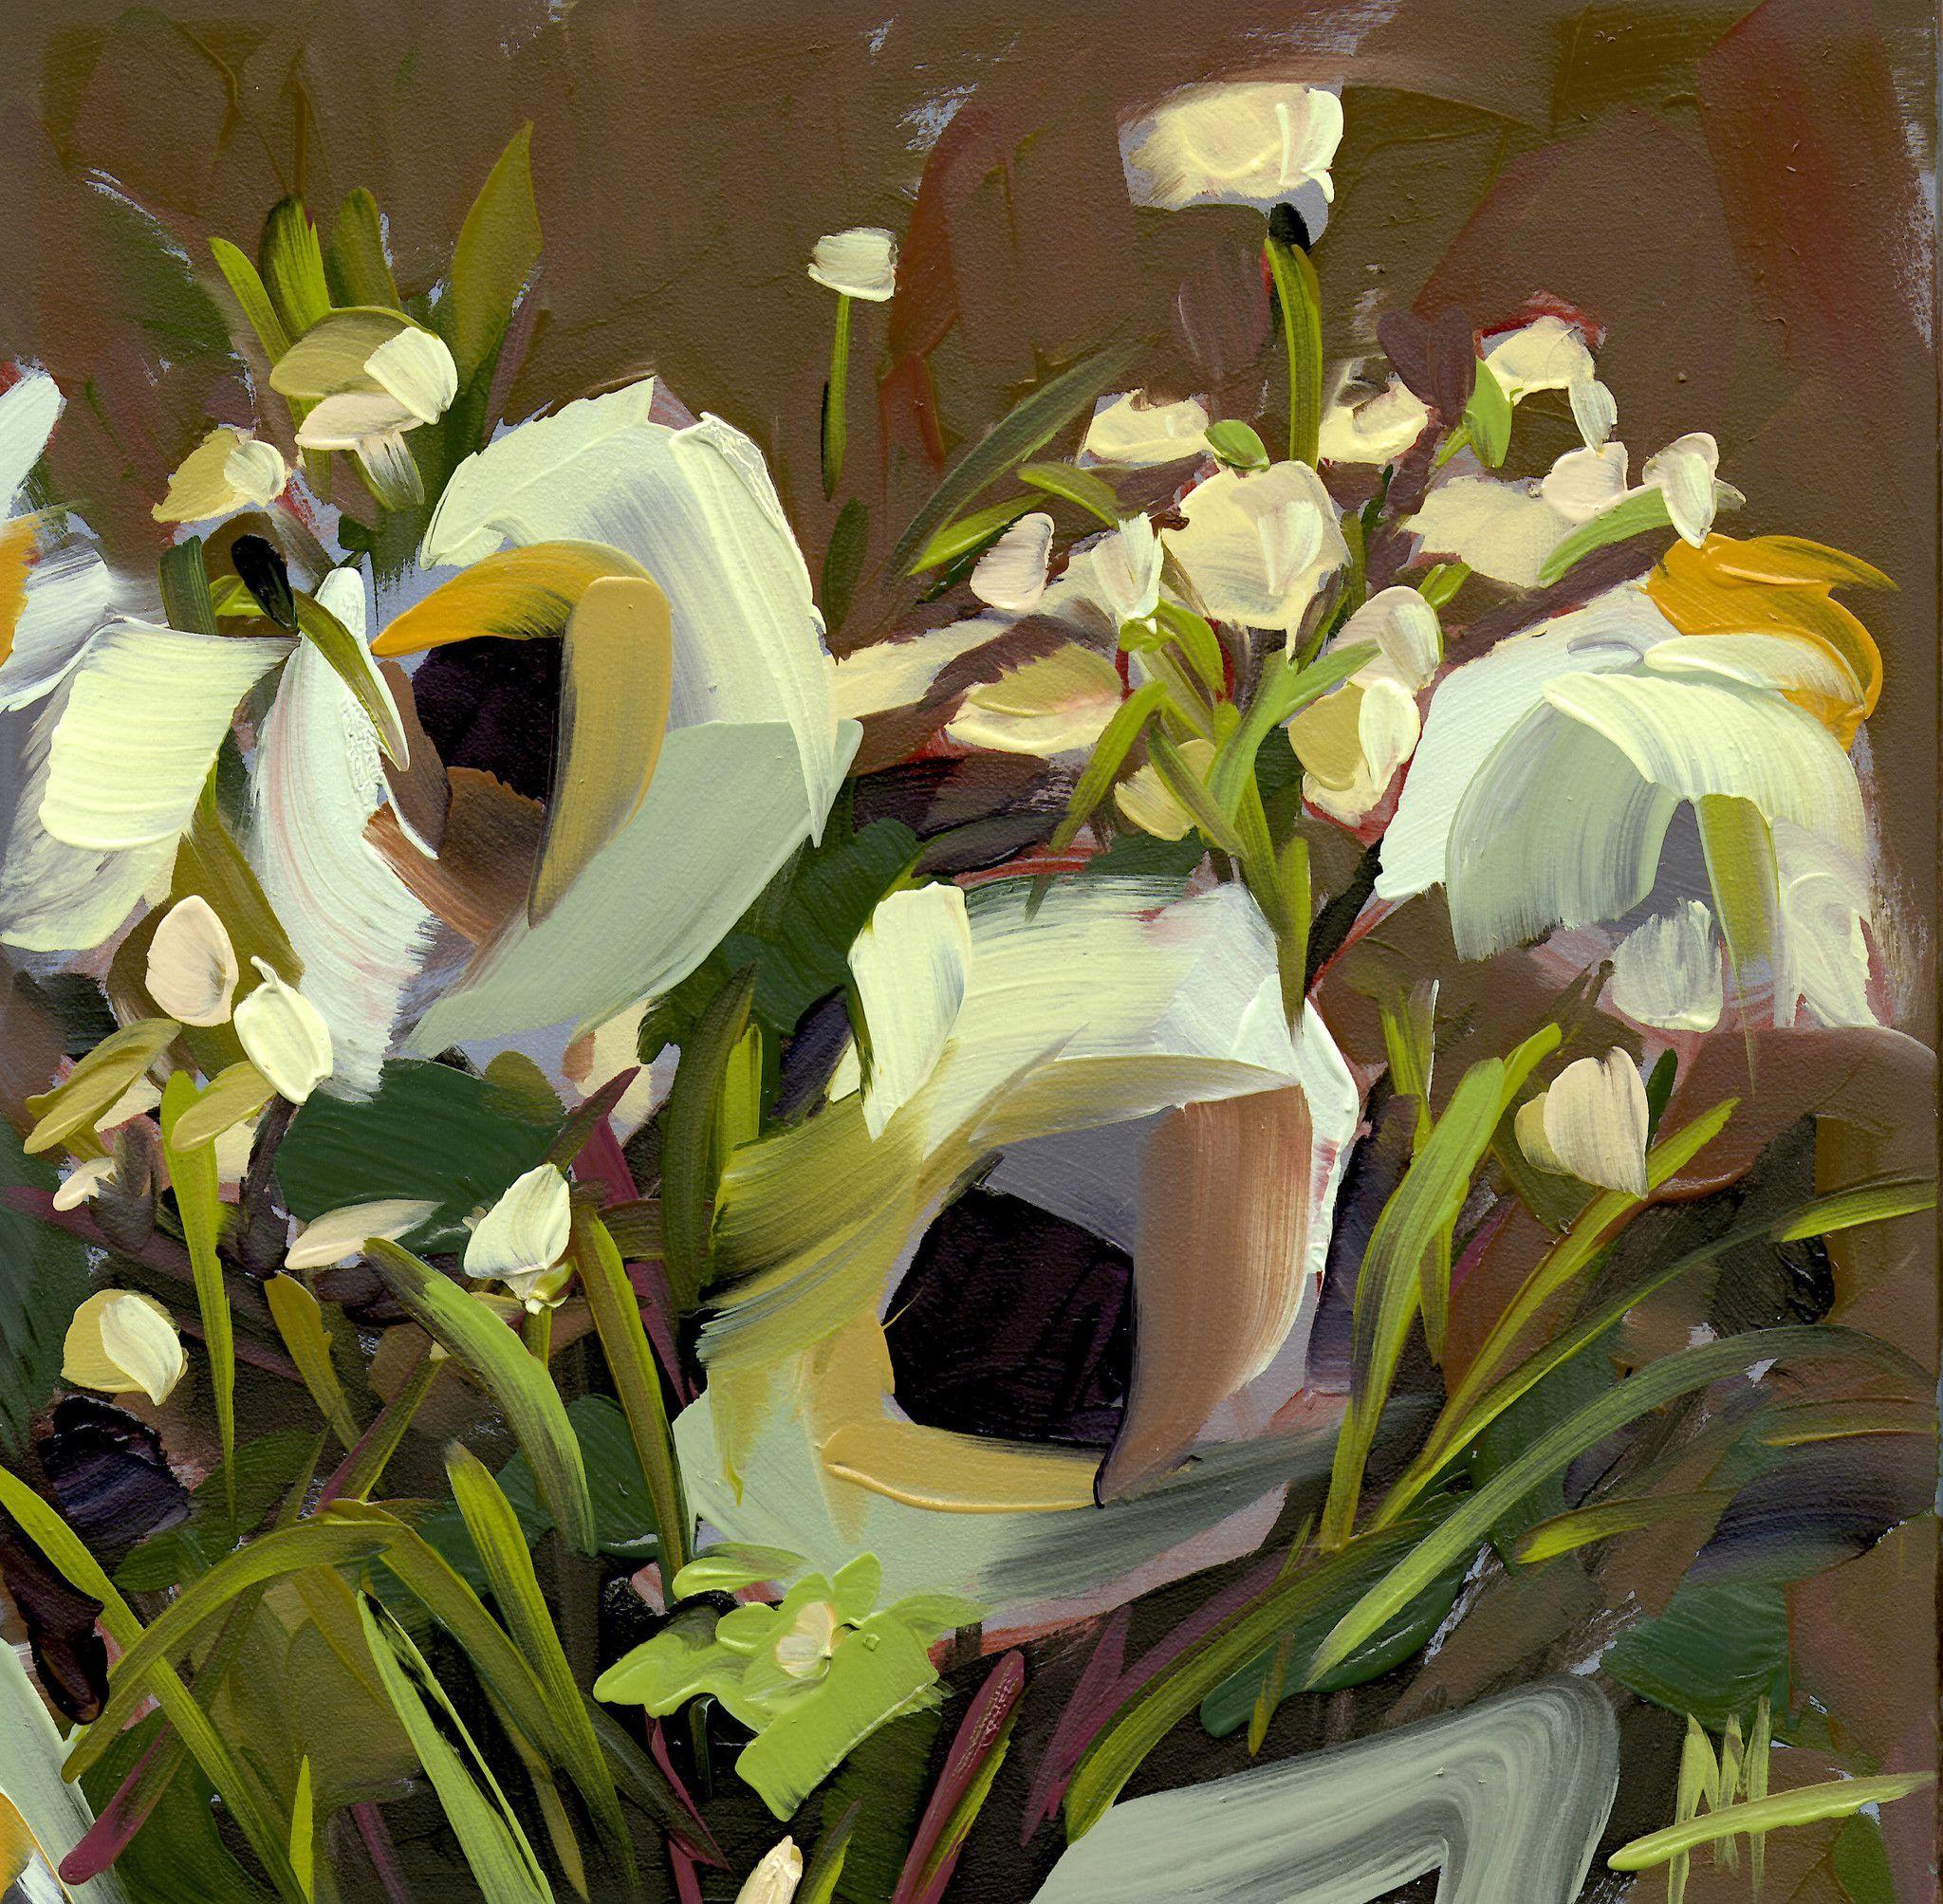 Cream Bouquet Art Print by Angela Moulton 8 x 8 inch | ARTE ...